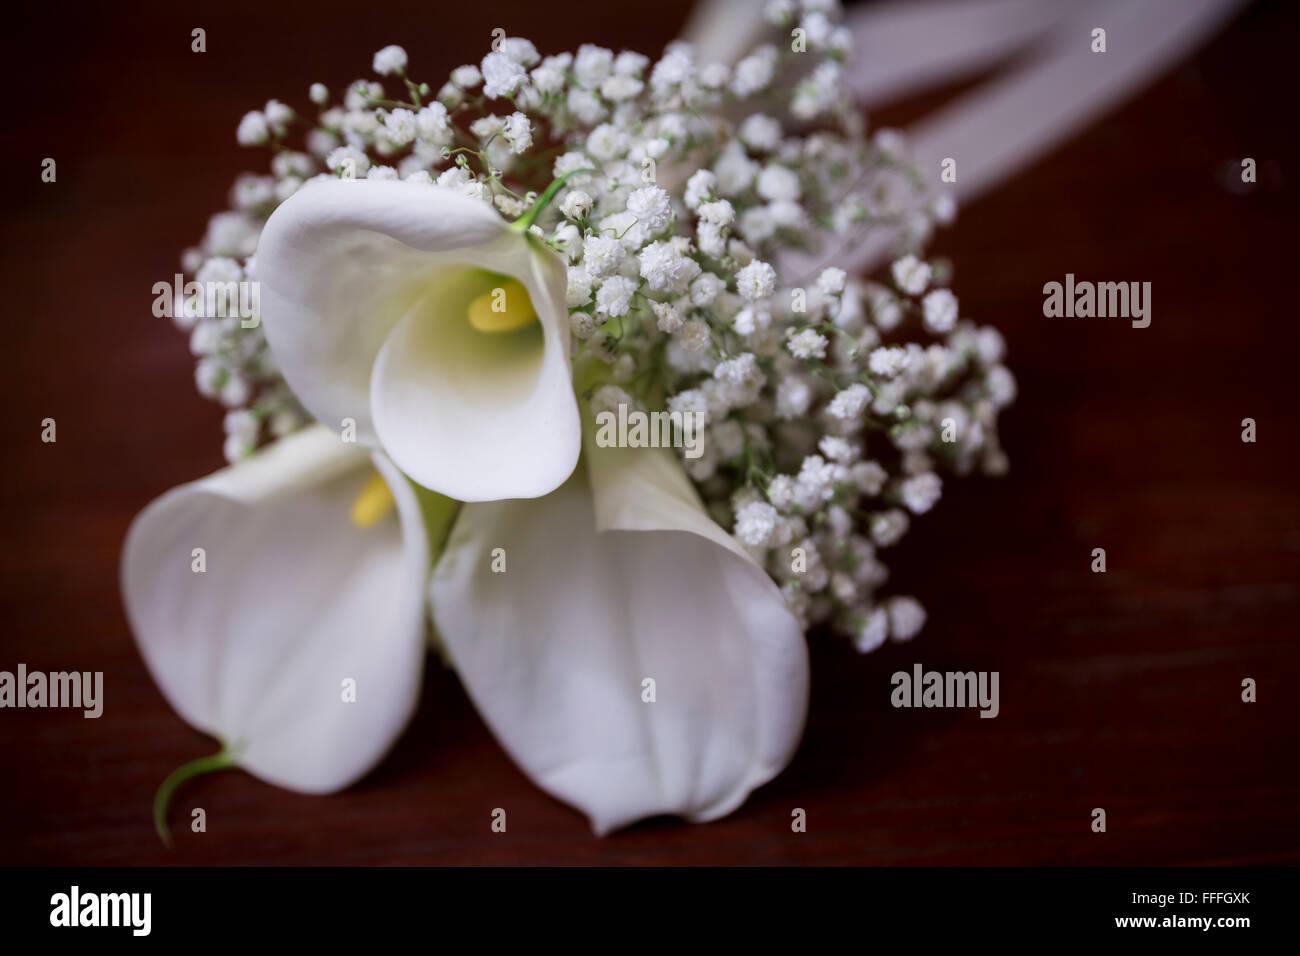 White calla lily flower bouquet stock photo 95614251 alamy white calla lily flower bouquet izmirmasajfo